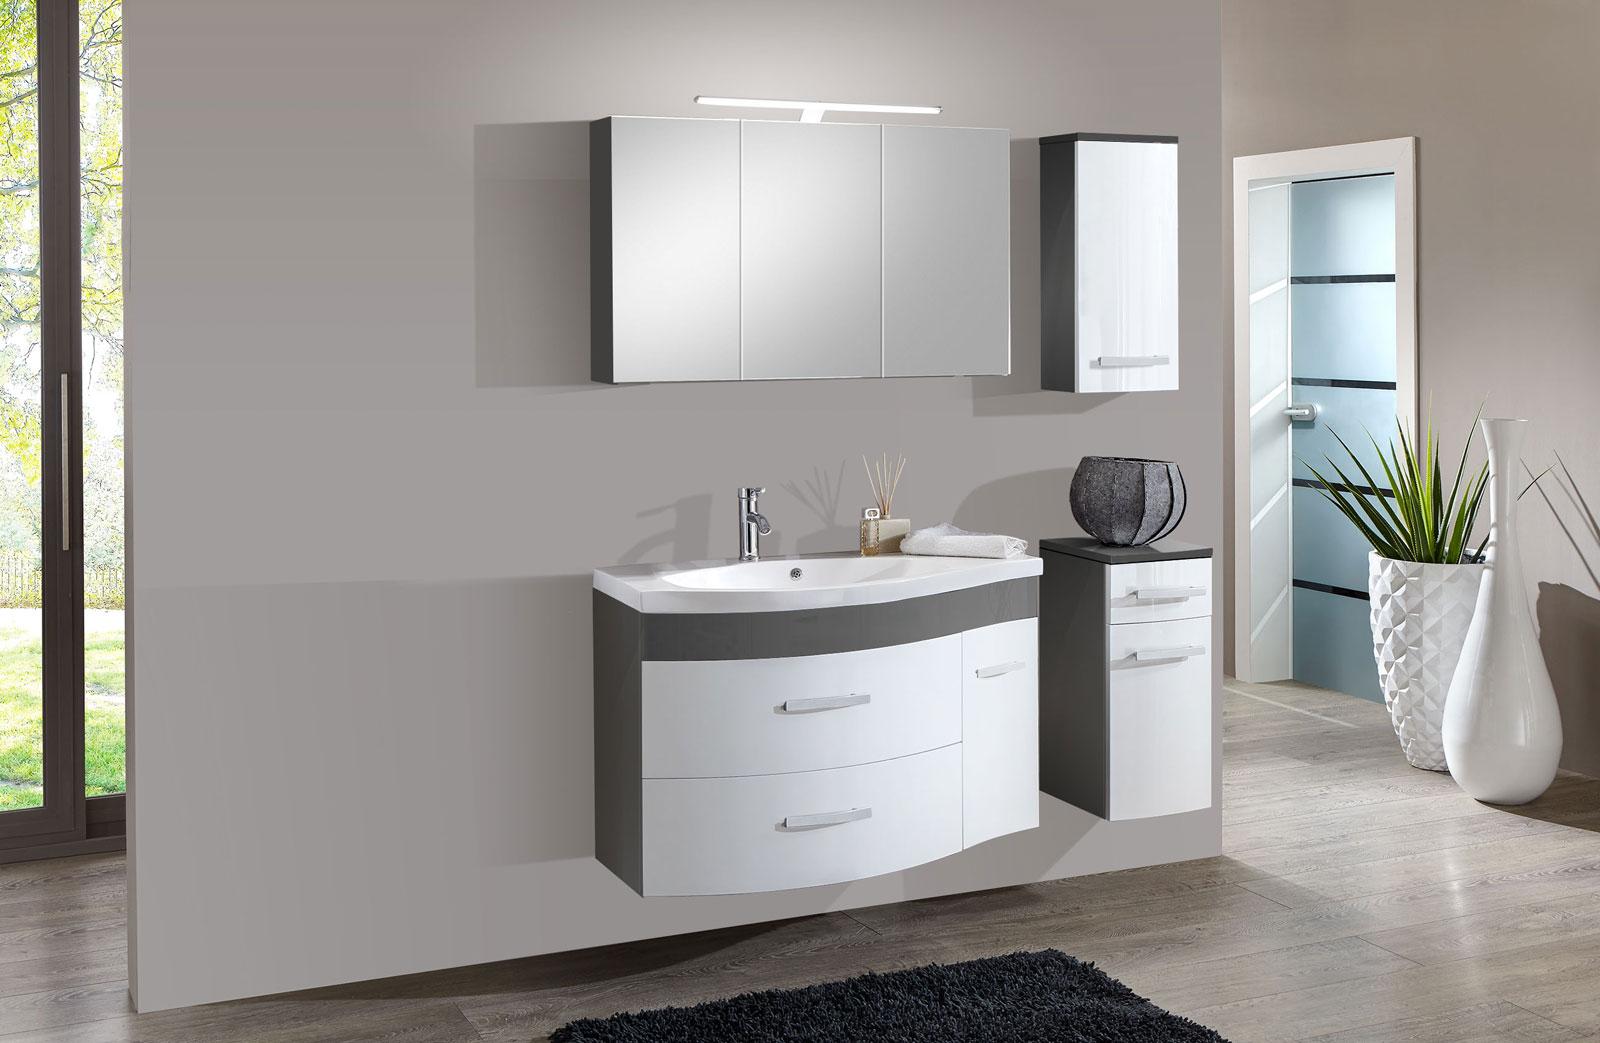 sam 4tlg badezimmer set hochglanz wei grau 110cm lugano. Black Bedroom Furniture Sets. Home Design Ideas